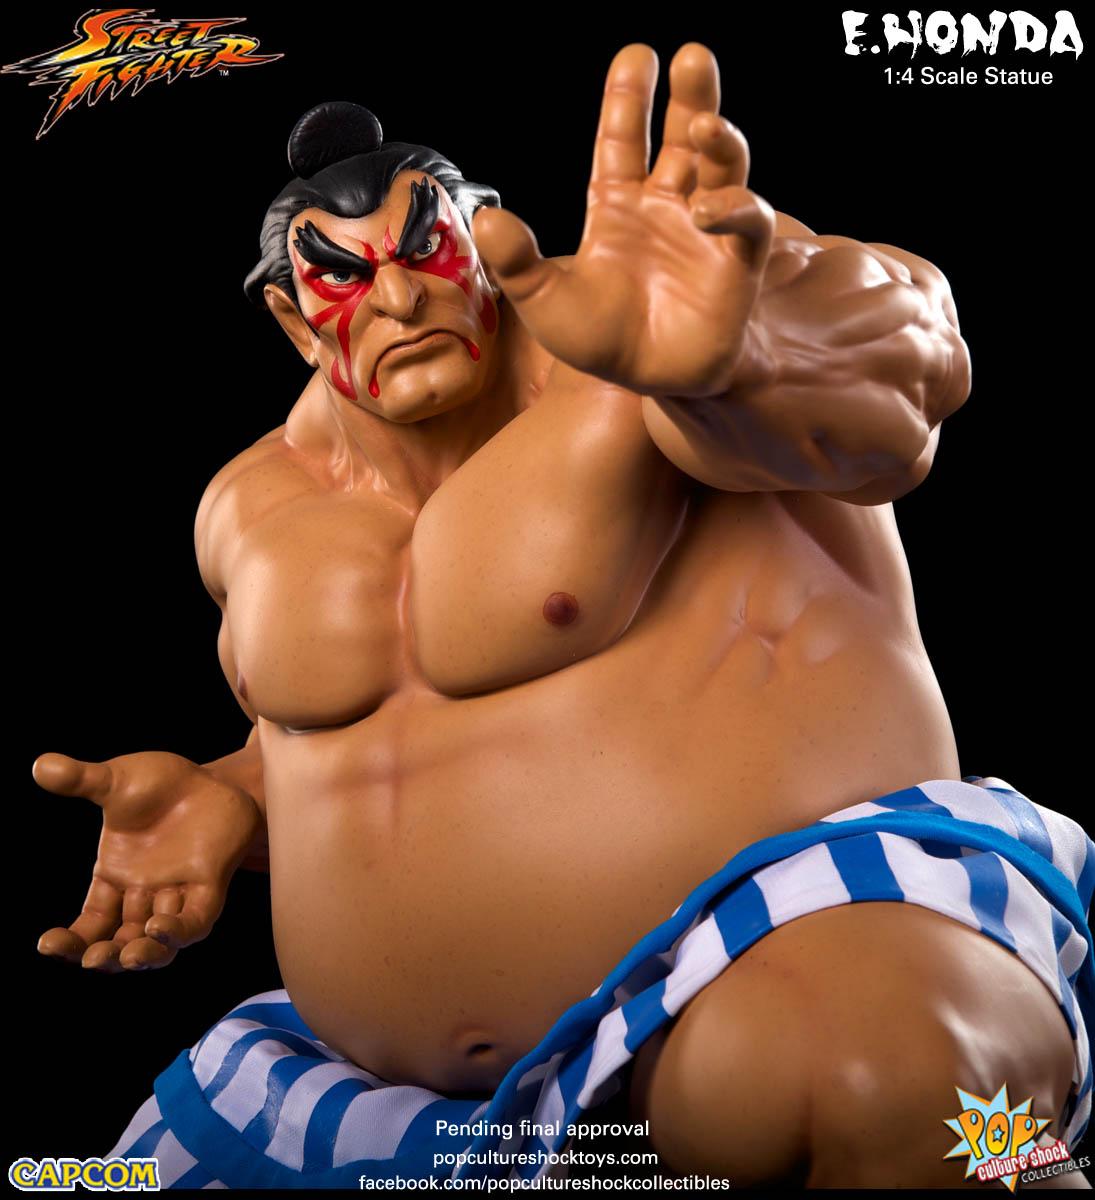 [Pop Culture Shock] Street Fighter: E. Honda 1/4 Statue - Página 3 Street-Fighter-E.-Honda-Regular-Statue-003